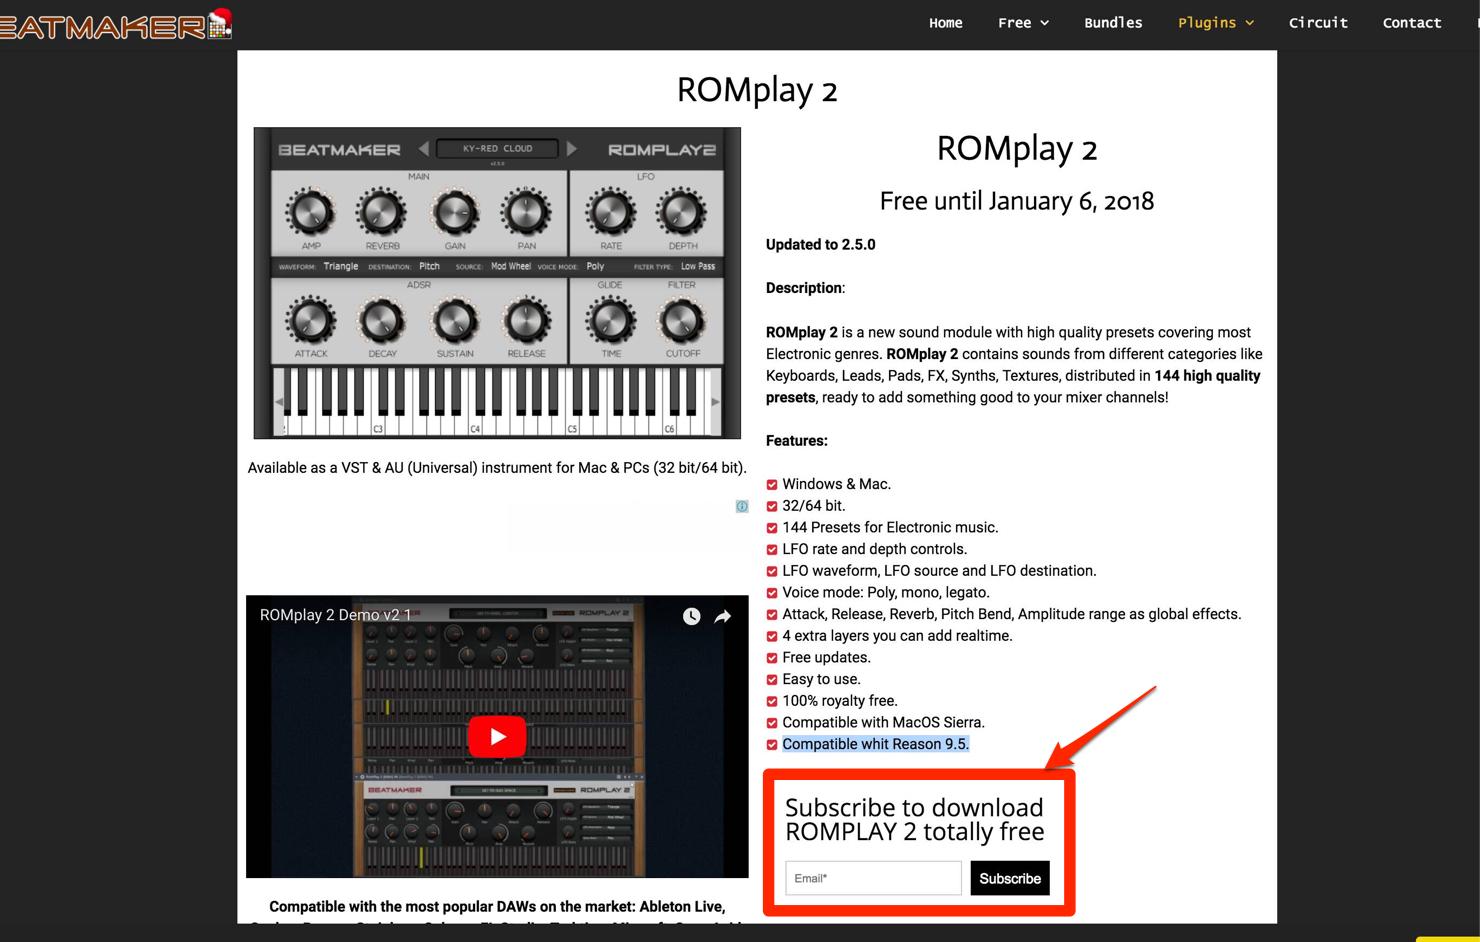 beatmaker-romplay2-free-1